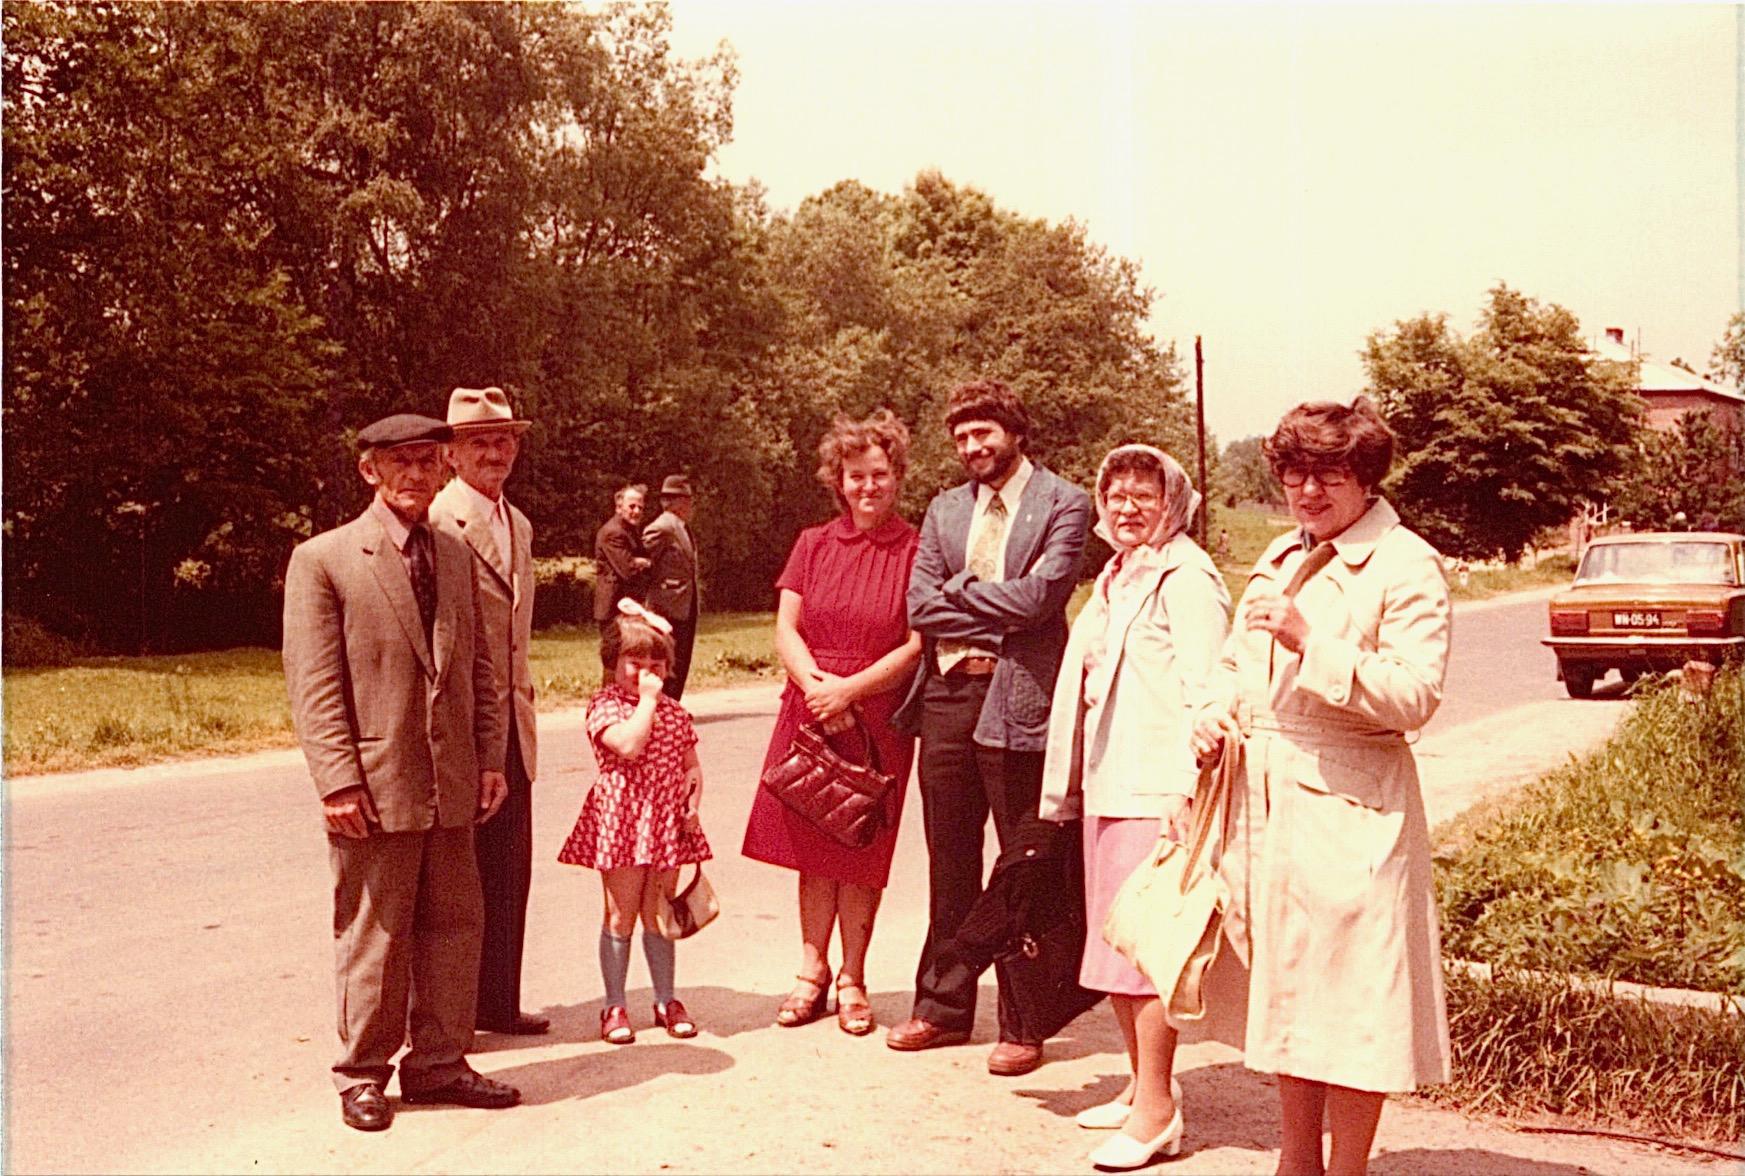 Anna Bogdan's son Peter (Piotr), a friend, Irena, Jadwiga, John Wagner, Mayme, & Eleanor Bogden Gudas in Rzemien, Poland, 1978